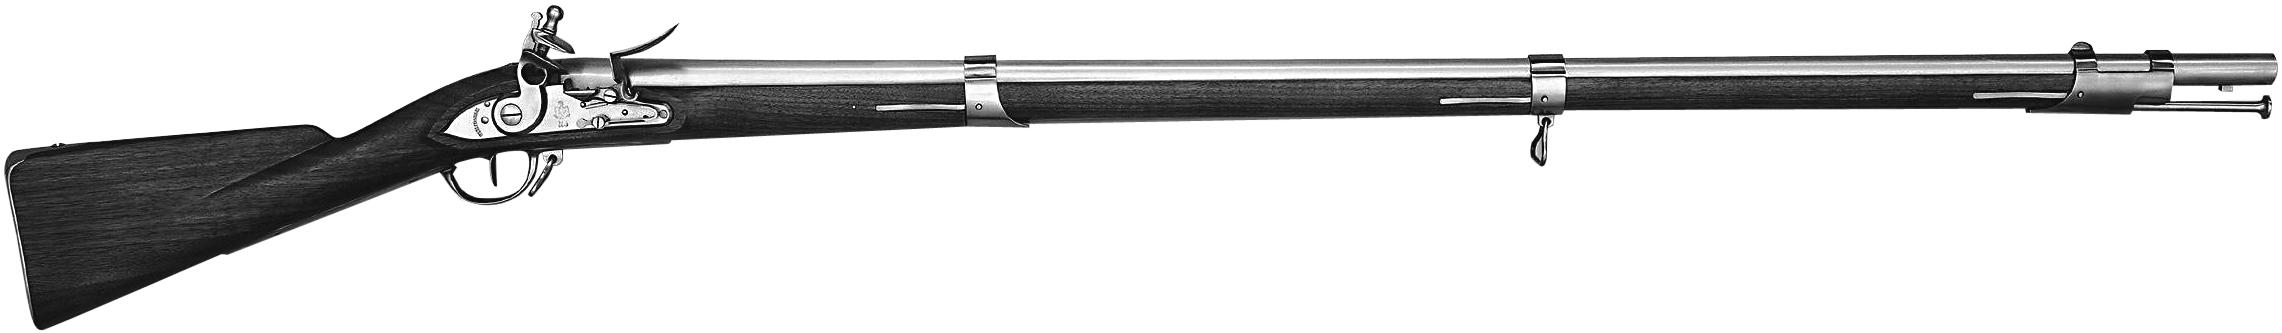 Springfield 1795 Musket